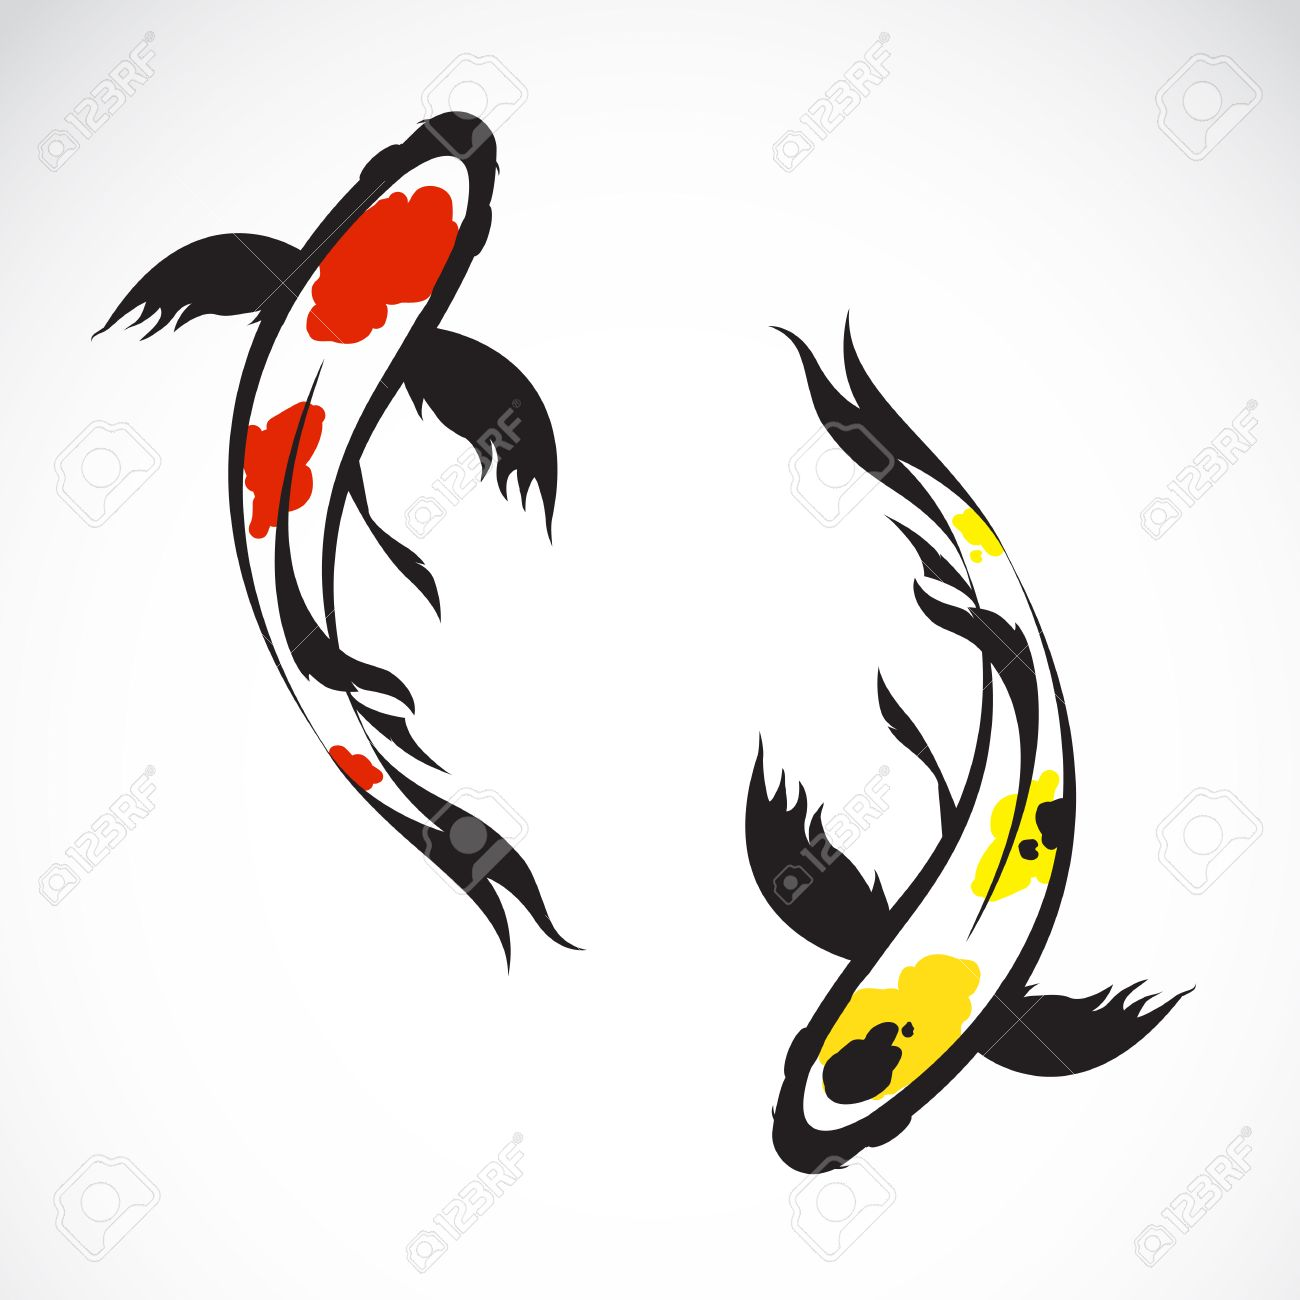 vector image of an carp koi on white background royalty free rh 123rf com koi fish vector art chinese koi fish vector